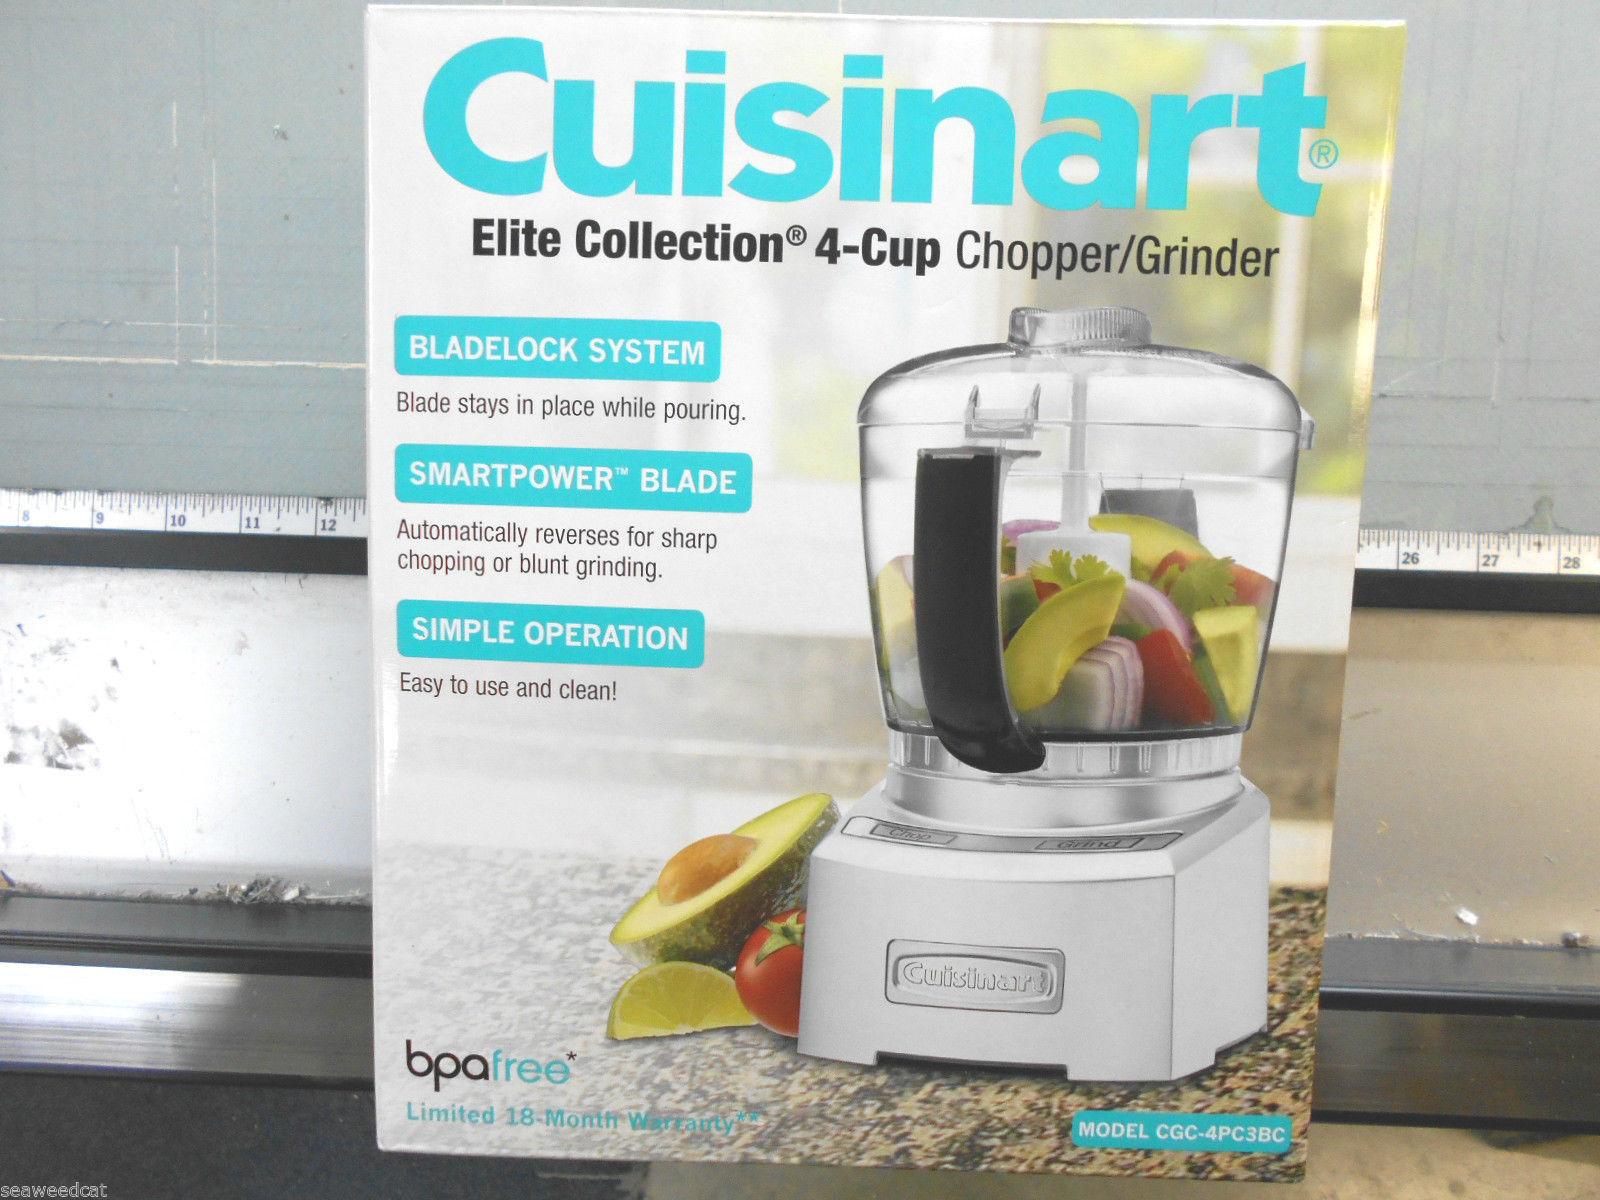 Cuisinart CH-4DC Elite Collection 4-Cup Chopper/Grinder, Die Cast